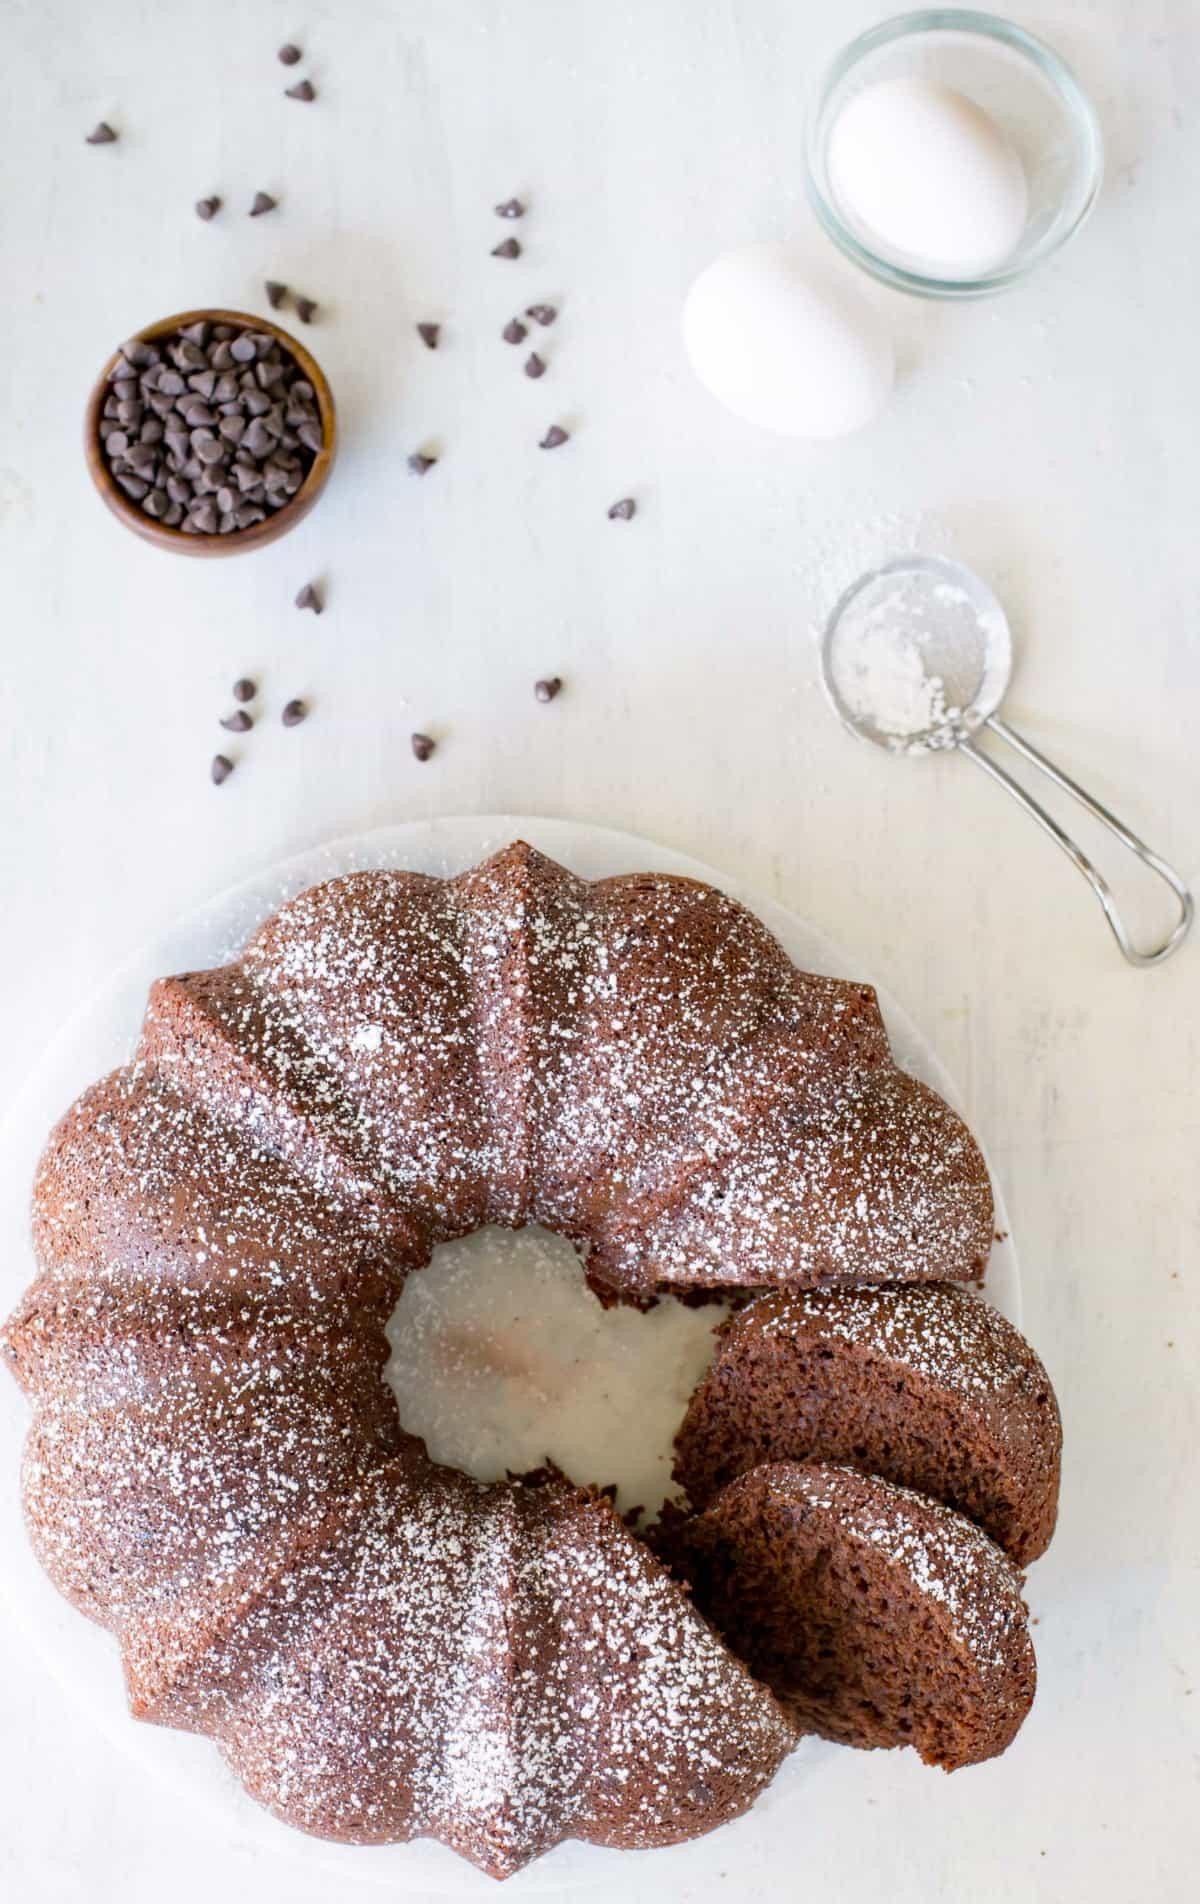 Chocolate Buttermilk Bundt Cake Recipe - Moist chocolate bundt cake that has only 4 WW Plus Points per serving!